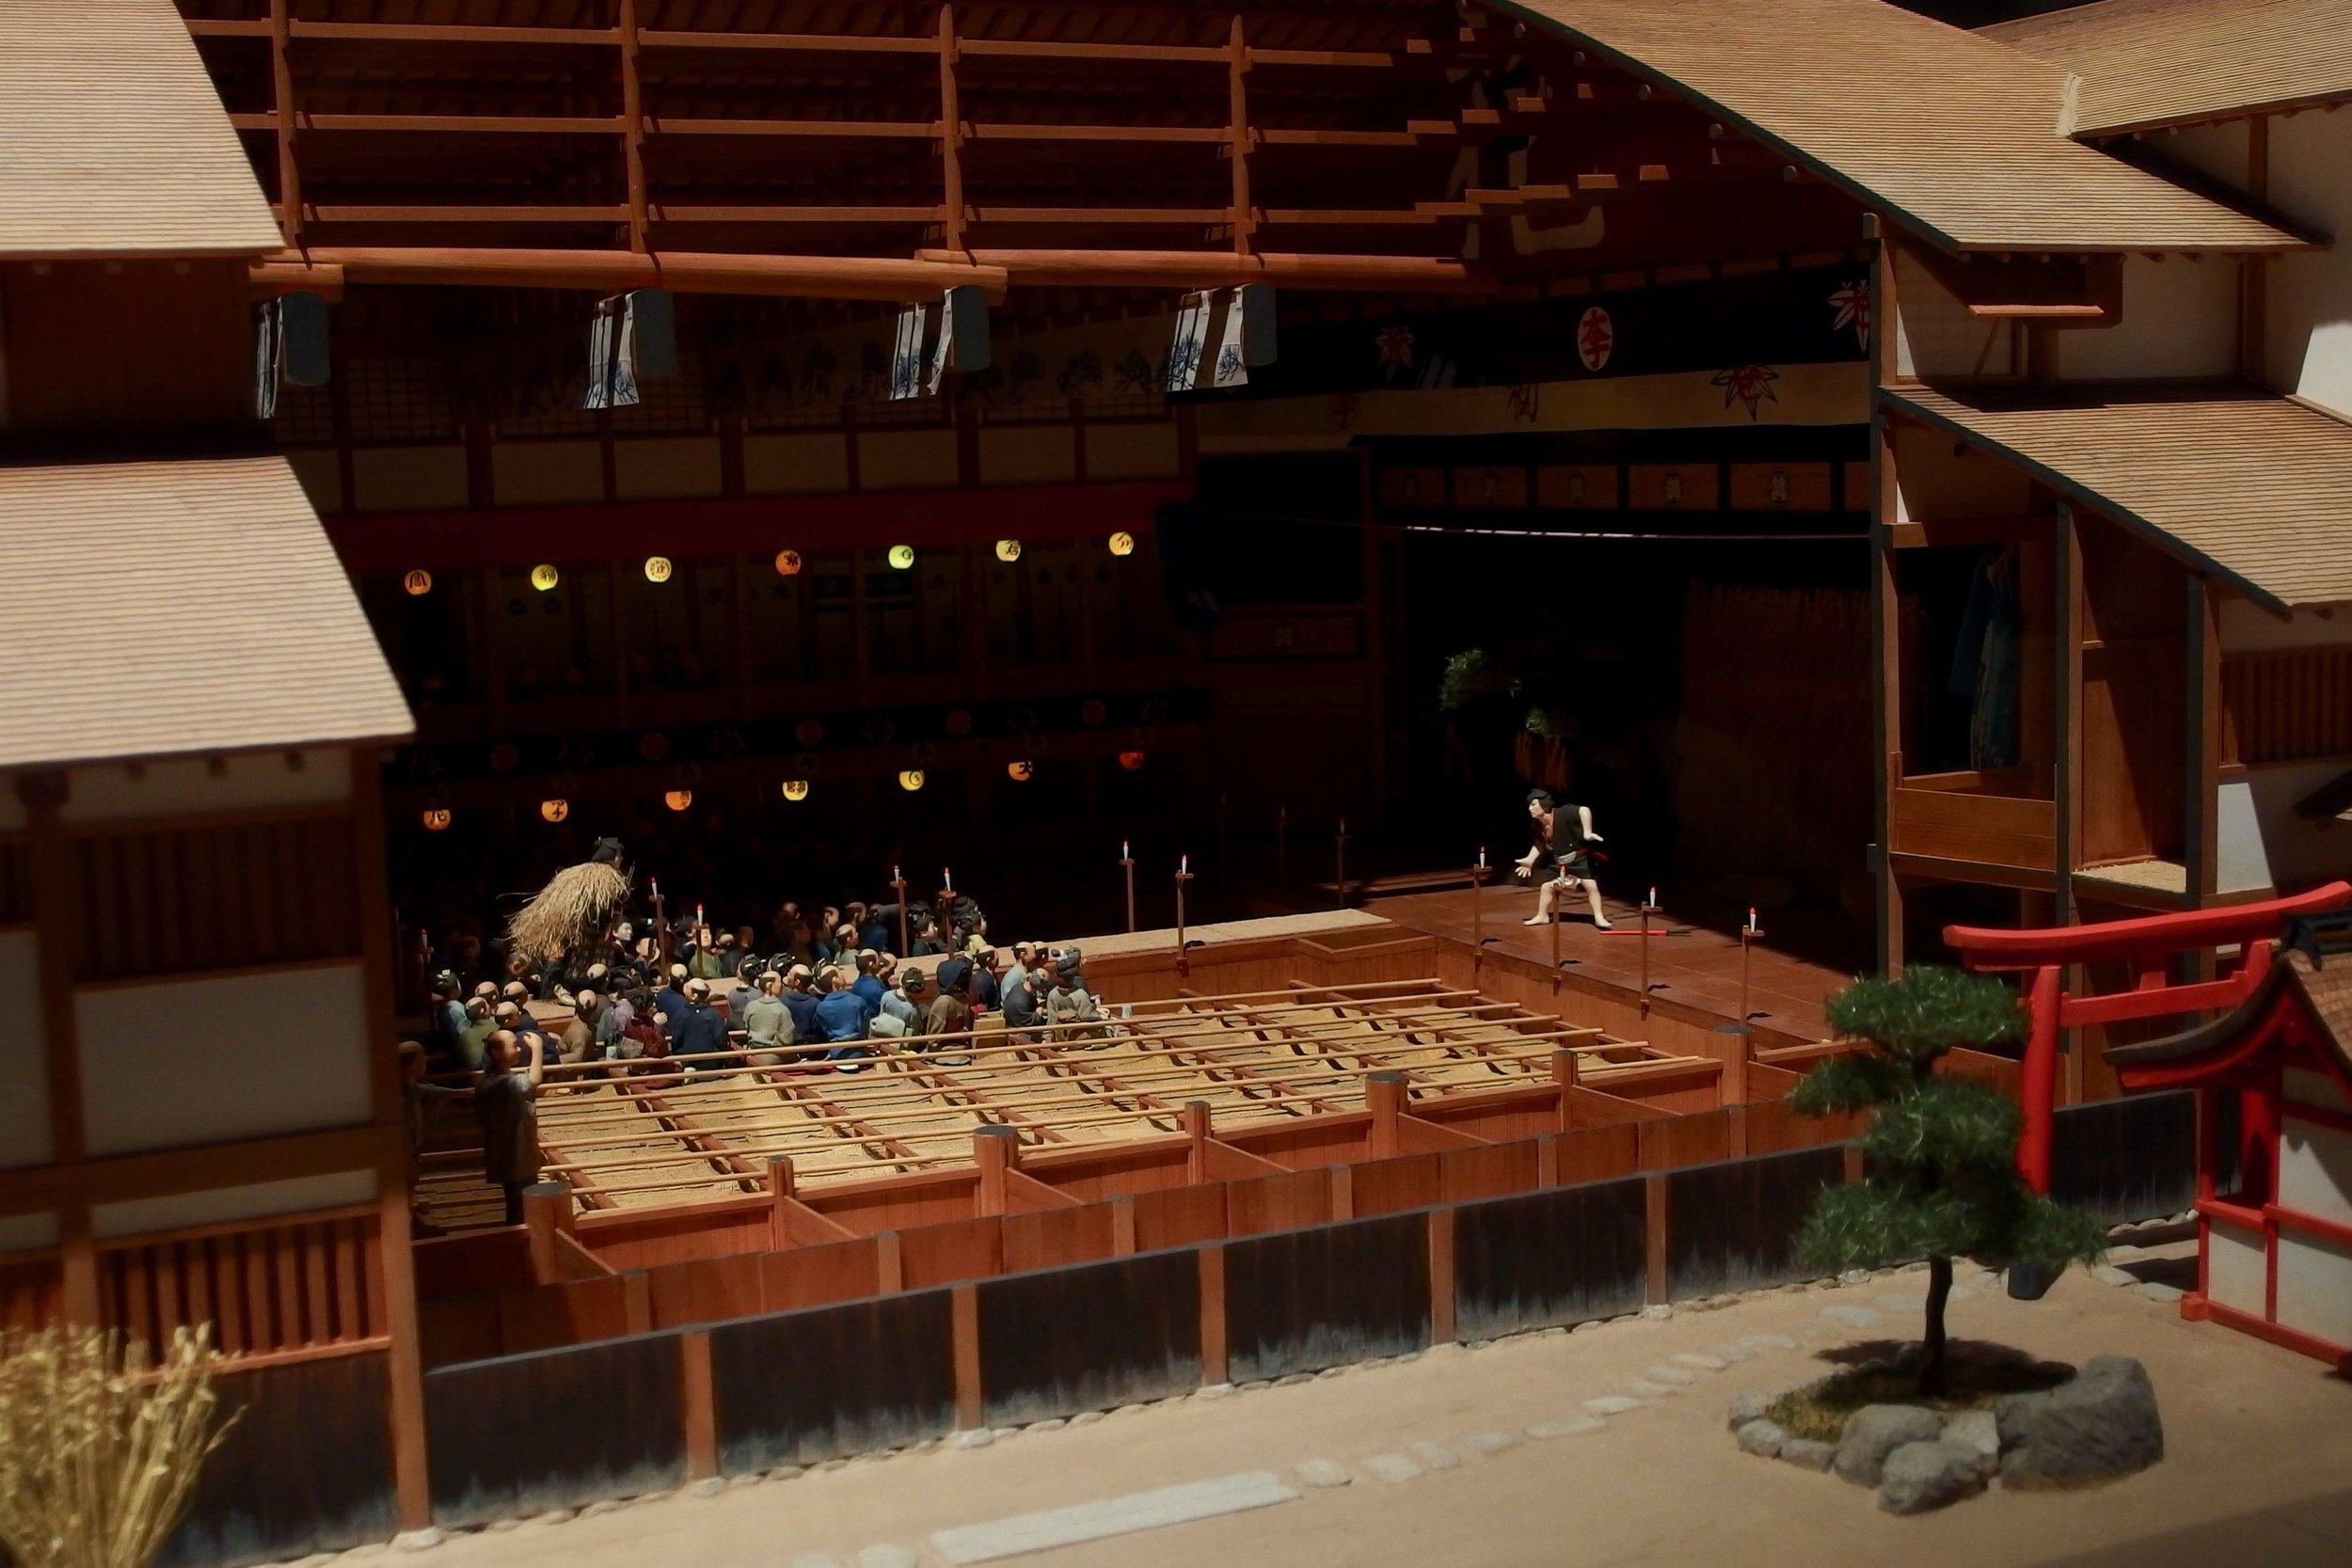 osaka museum of history cutaway model theatre.jpg